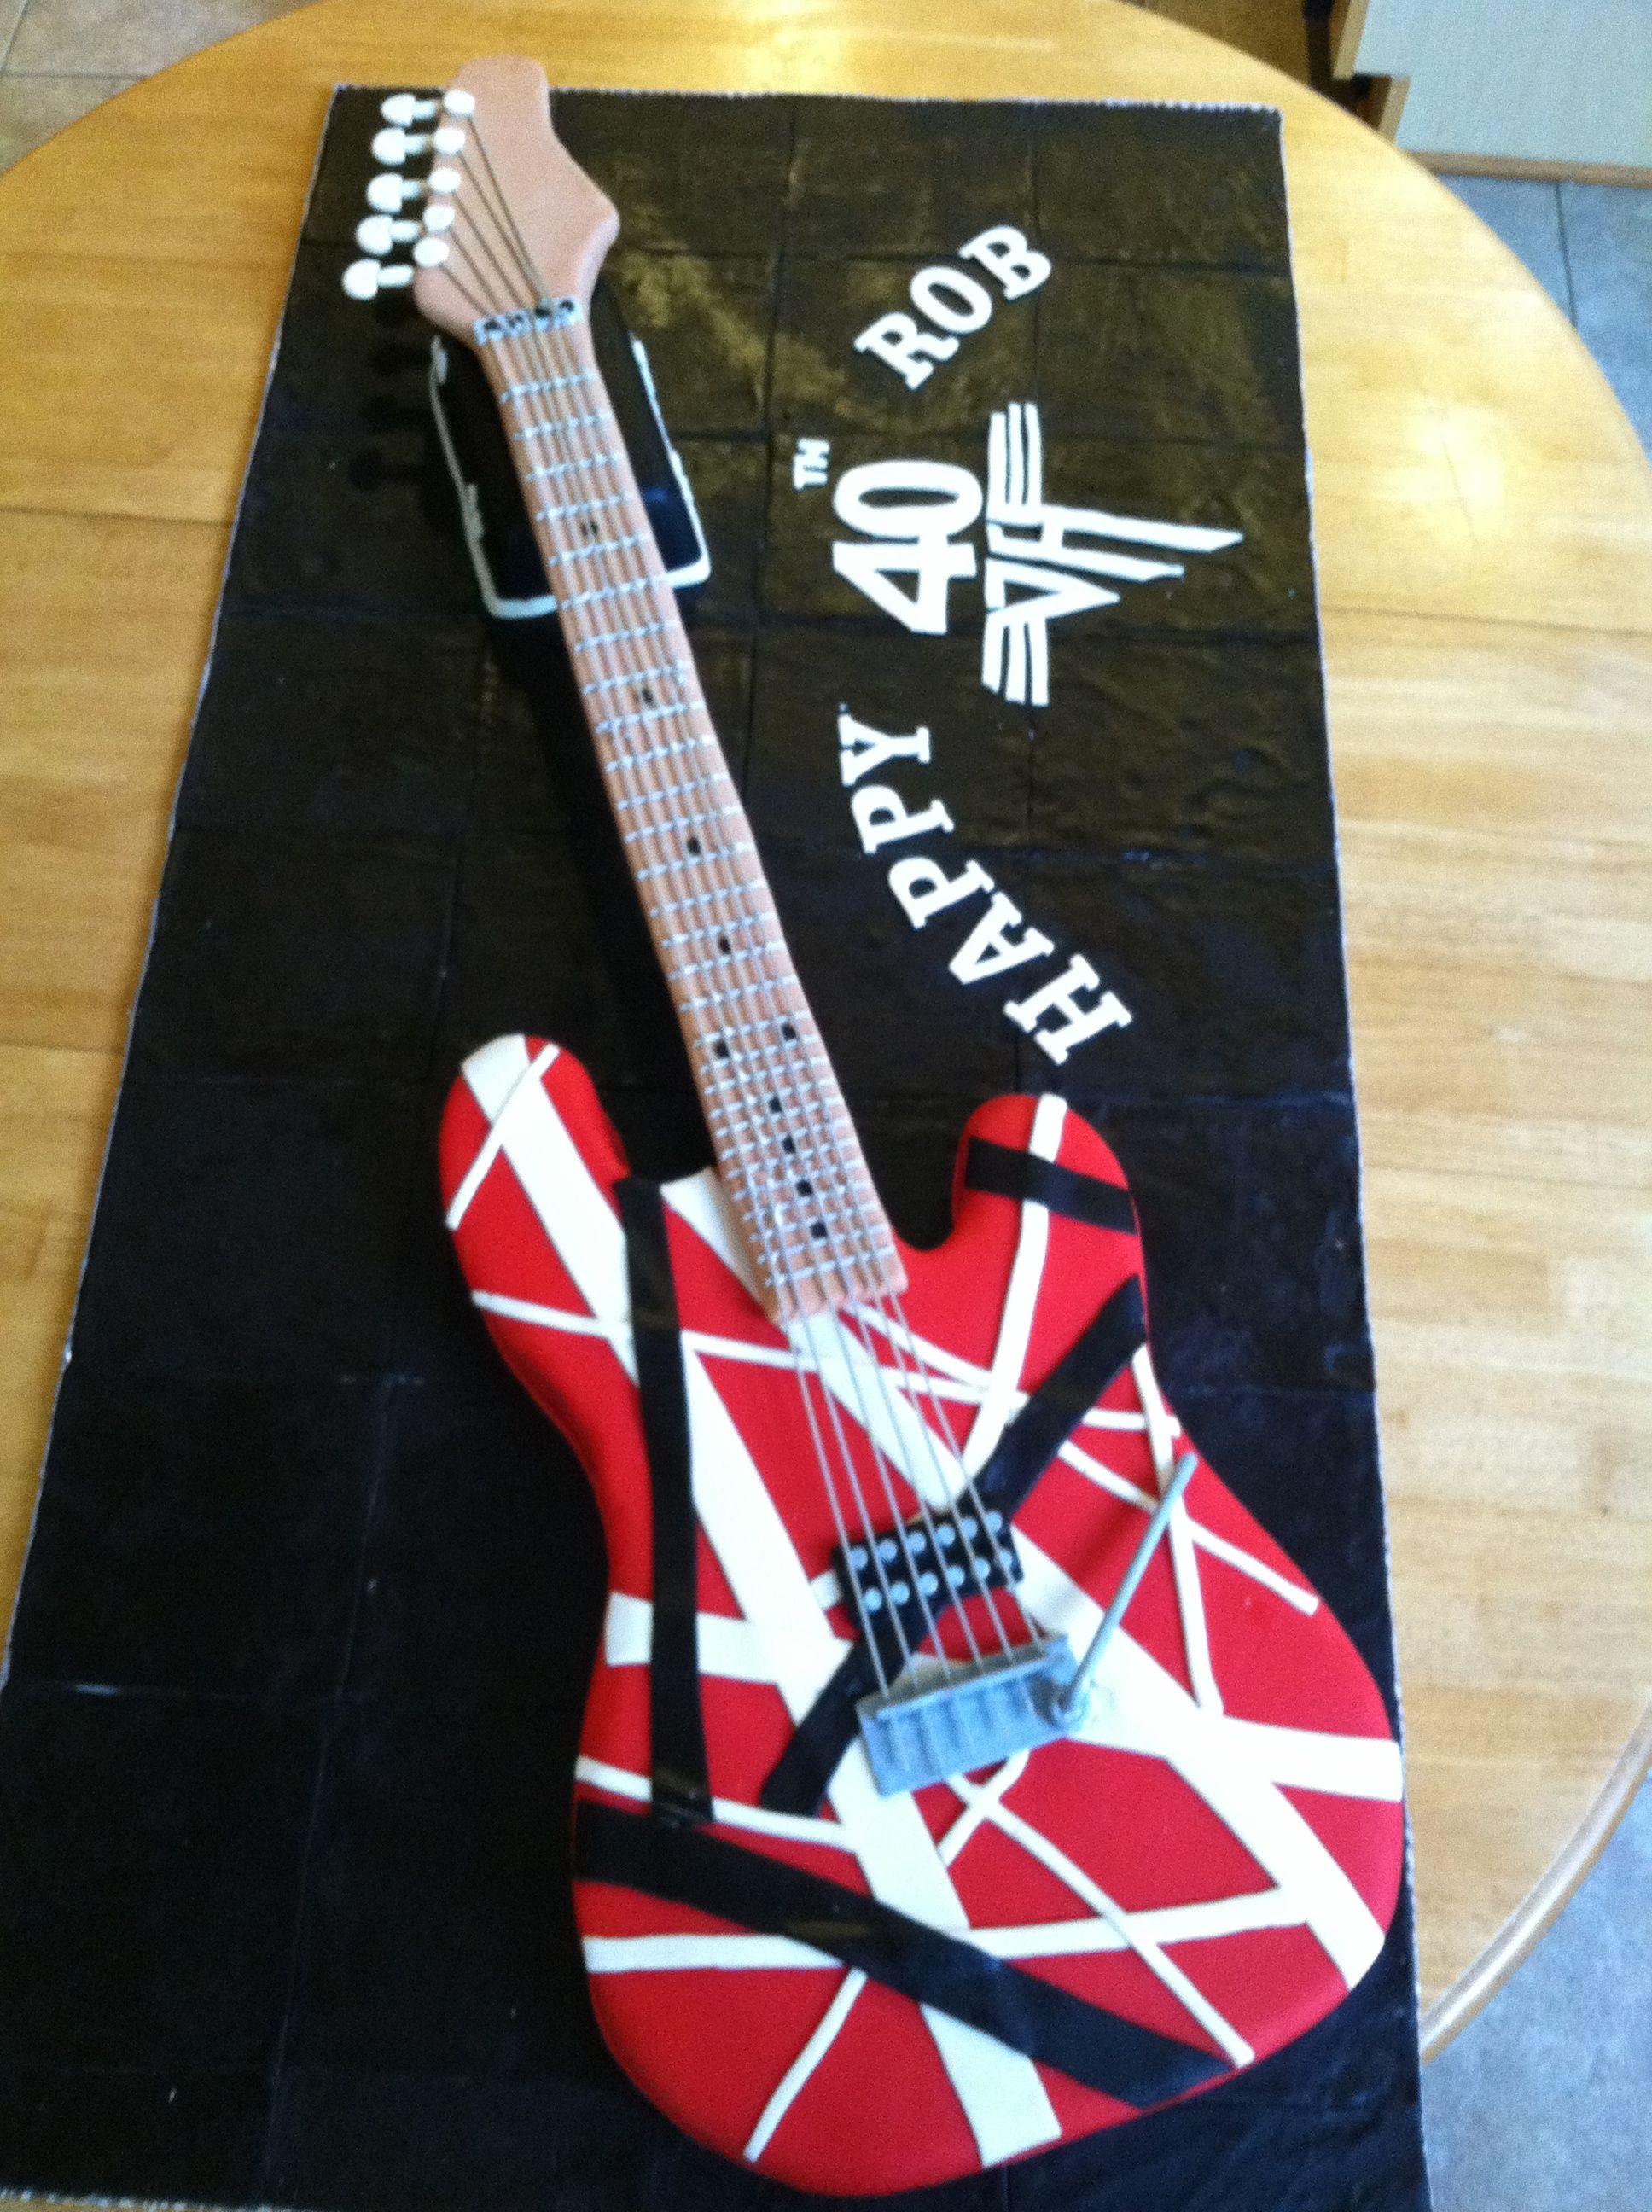 Van Halen Birthday Cake 3 Guitar Cake 40th Birthday Cakes Van Halen